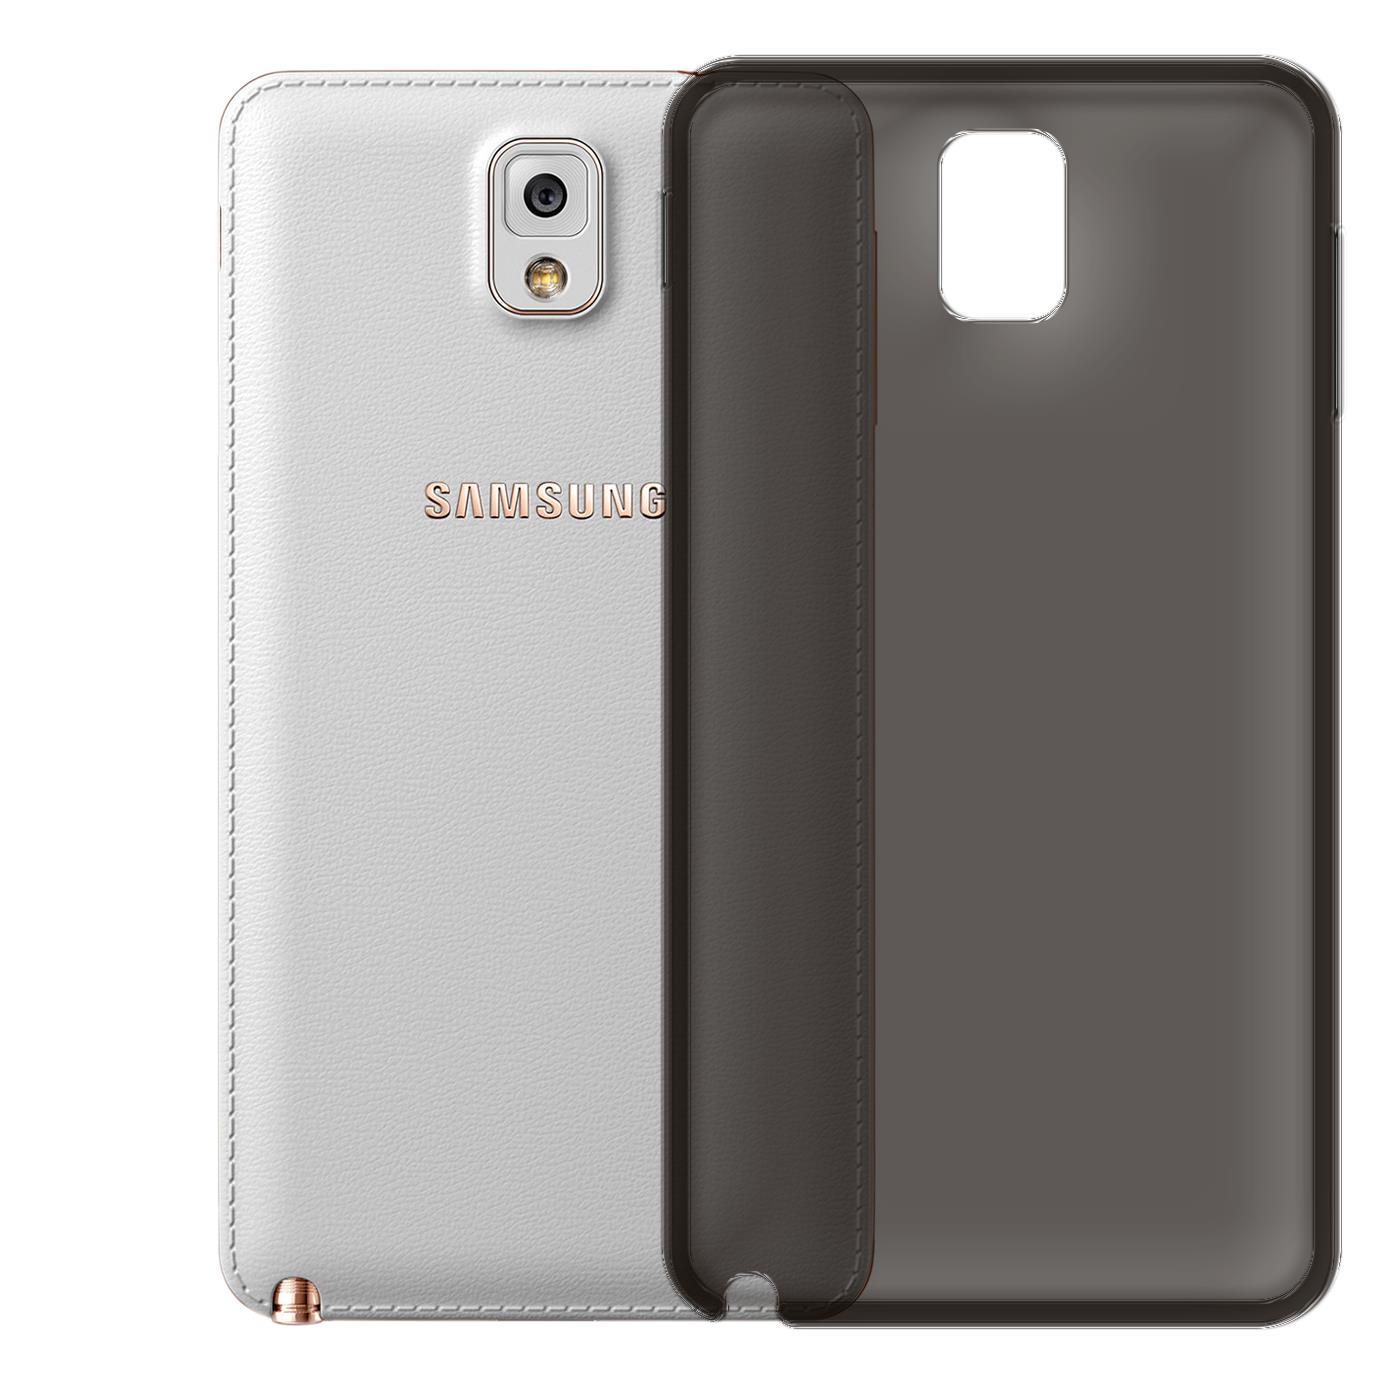 Samsung-Galaxy-Note-4-Thin-Silikon-Klar-Case-Cover-Ultra-Slim-Stossfeste-Gel Indexbild 28